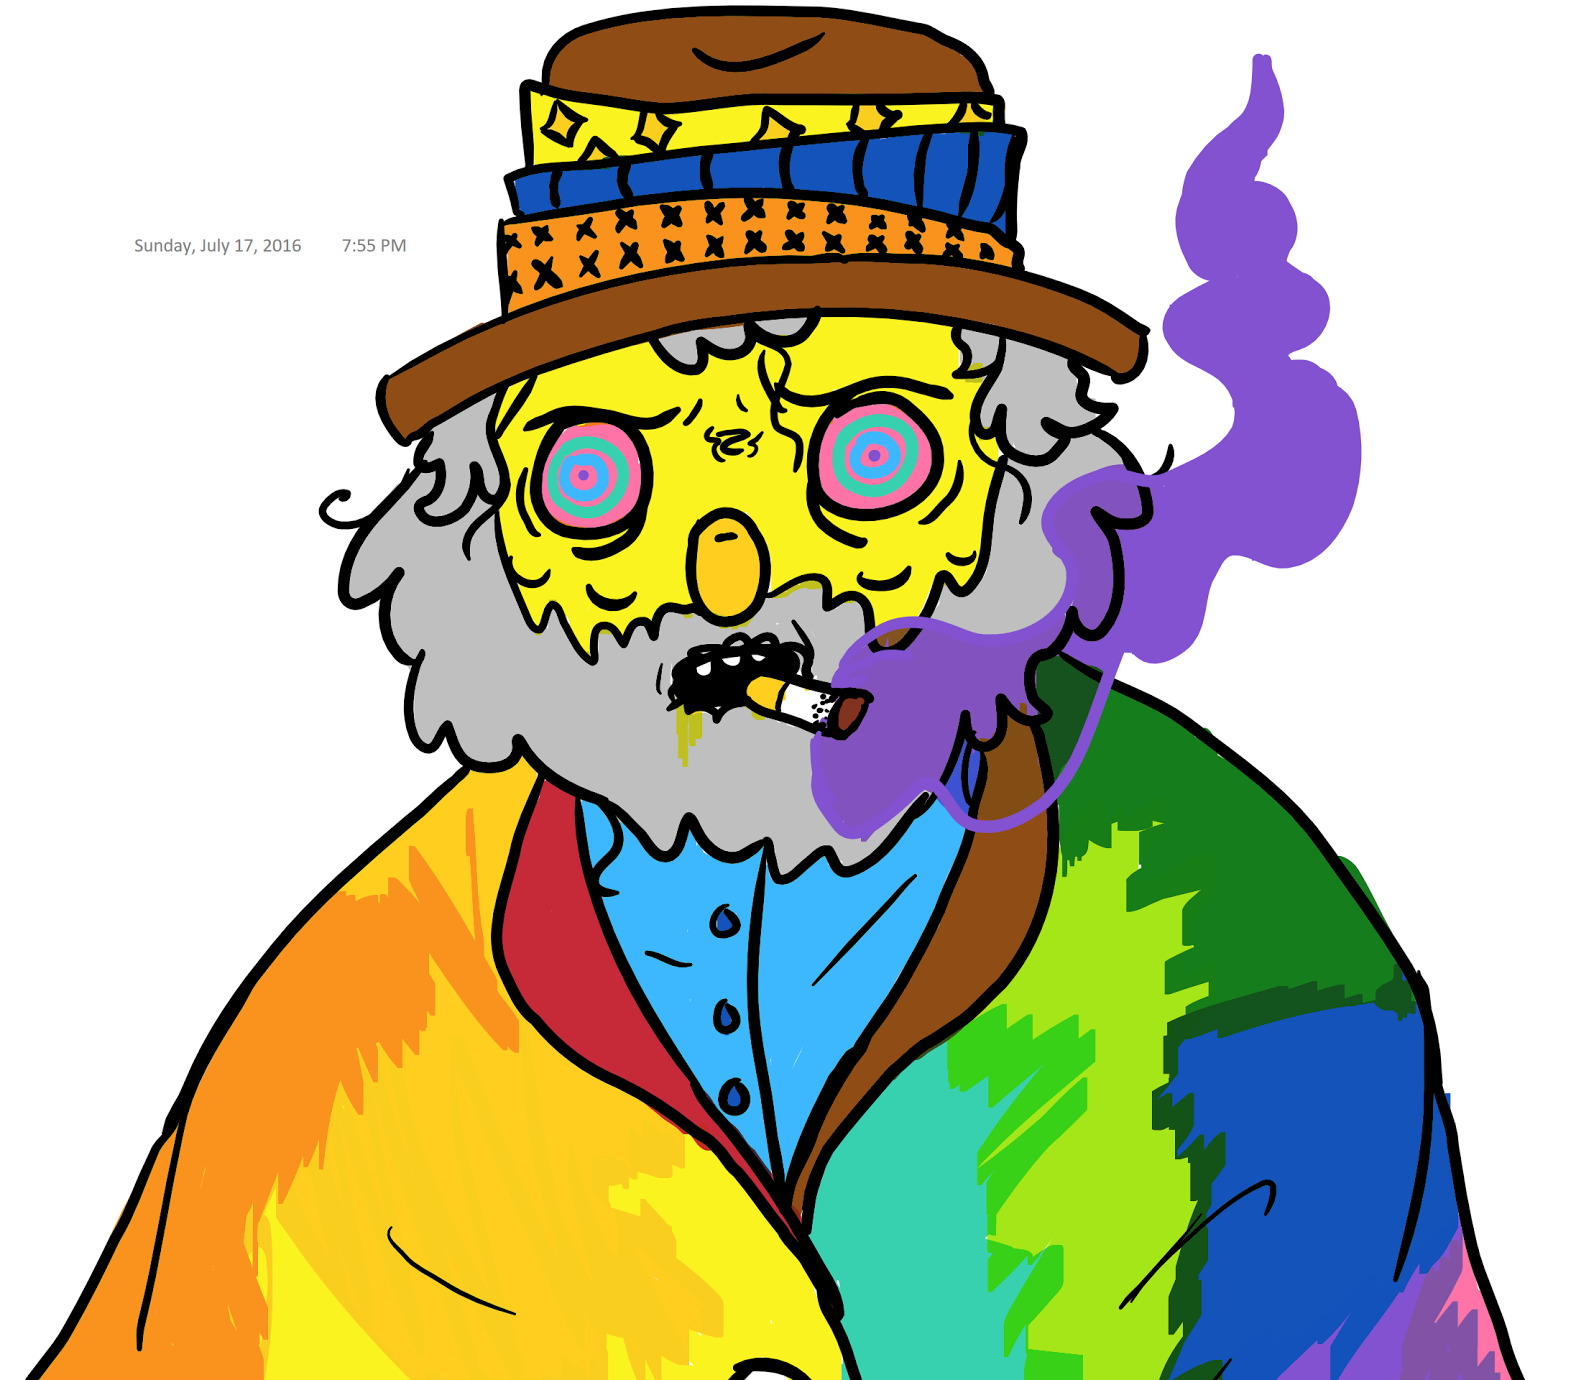 Colorboy